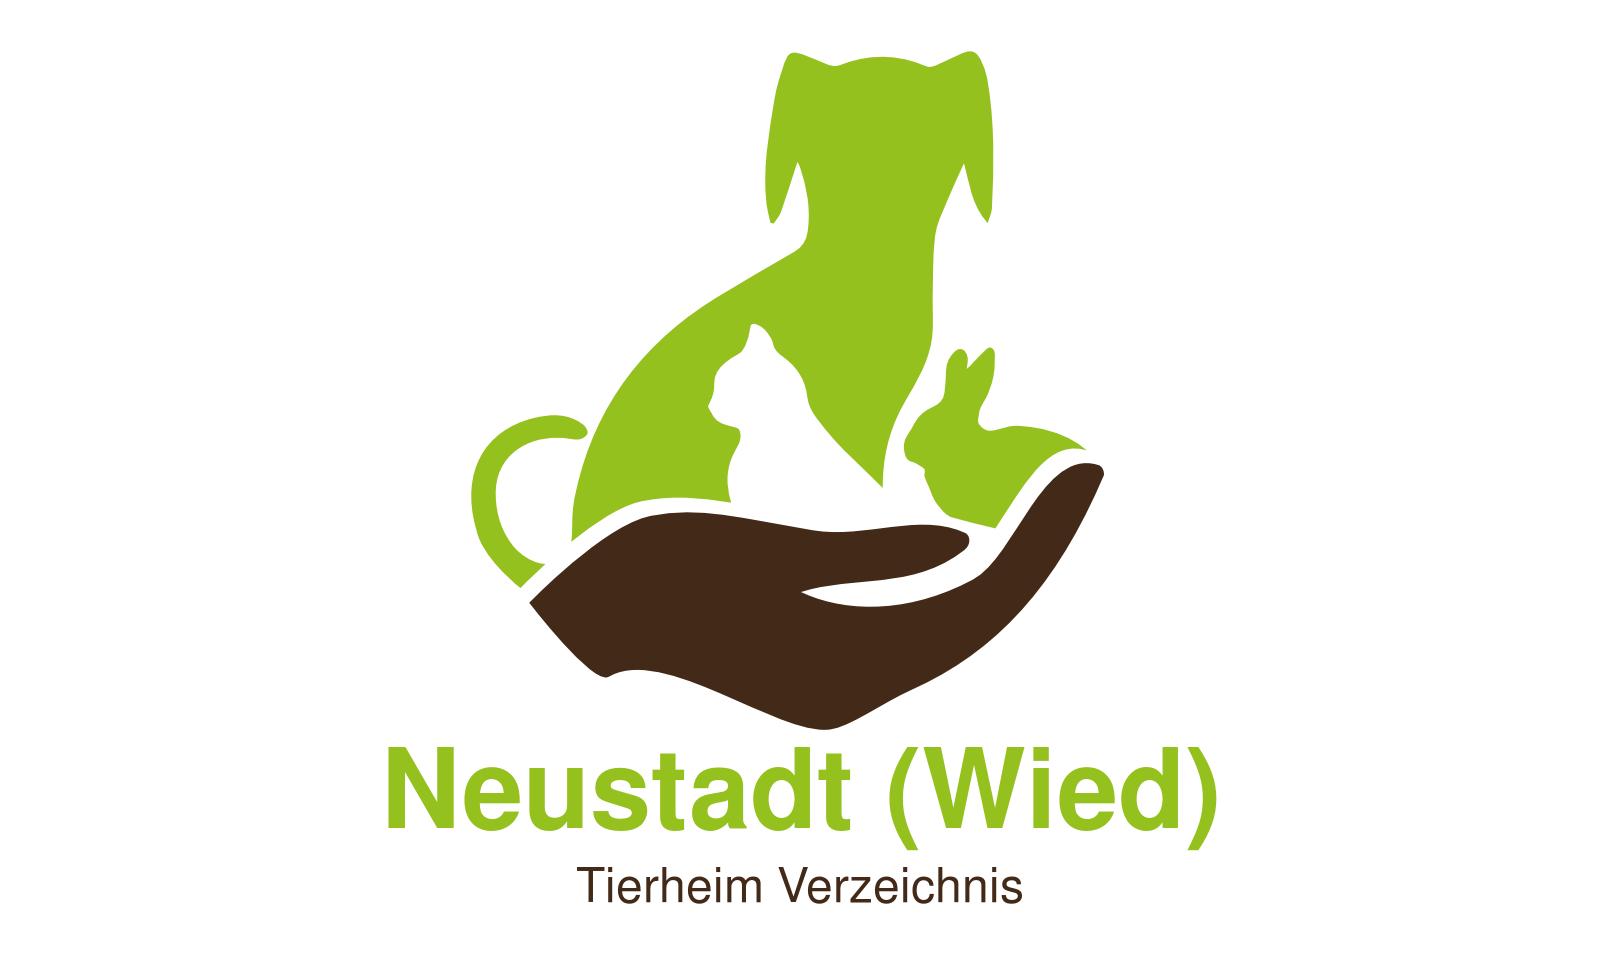 Tierheim Neustadt (Wied)